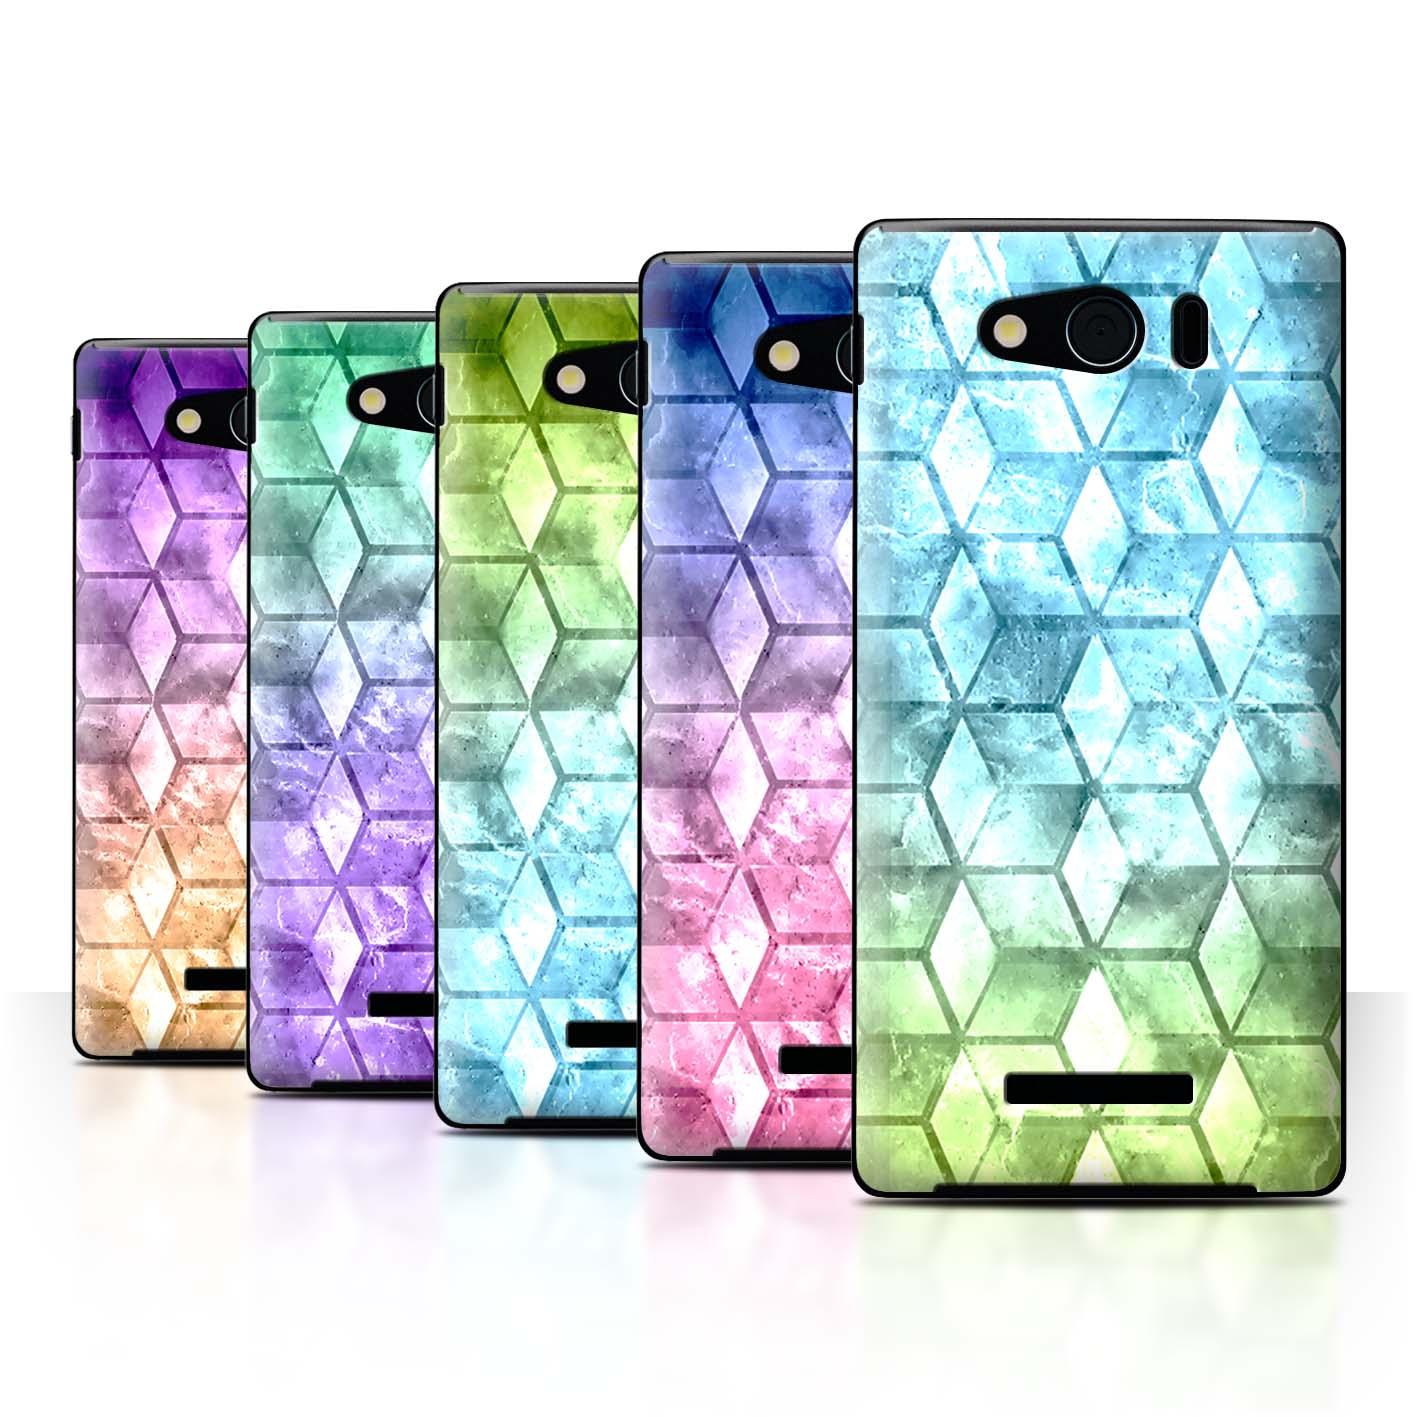 STUFF4-Back-Case-Cover-Skin-for-Sharp-Aquos-Xx-Mini-303SH-Colour-Cube